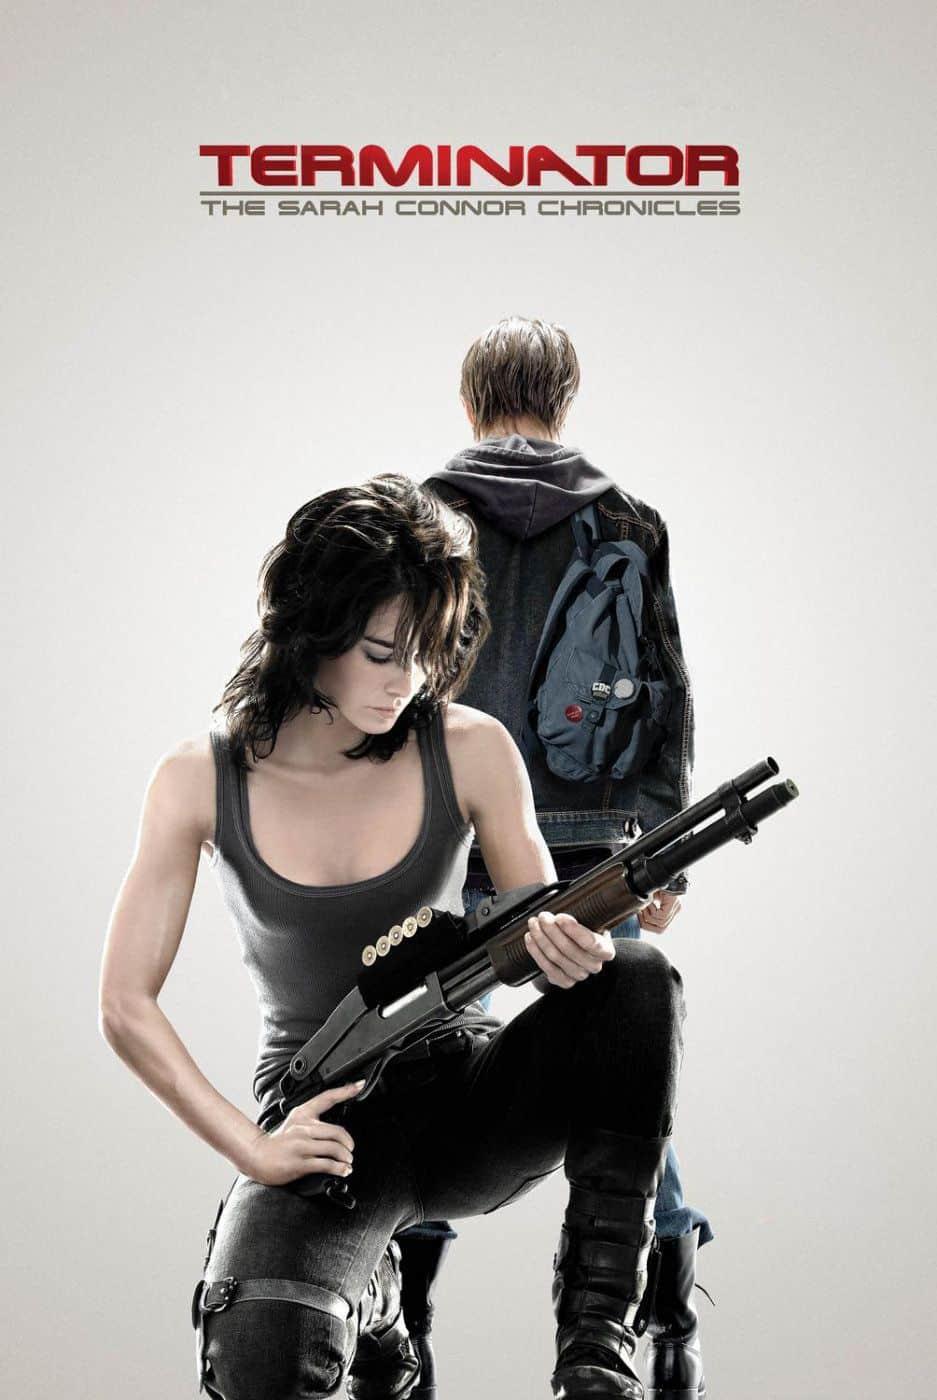 Terminator The Sarah Connor Chronicles Season 1 เทอร์มิเนเตอร์ กำเนิดสงครามคนเหล็ก ปี 1 พากย์ไทย EP1 – EP9 [จบ]